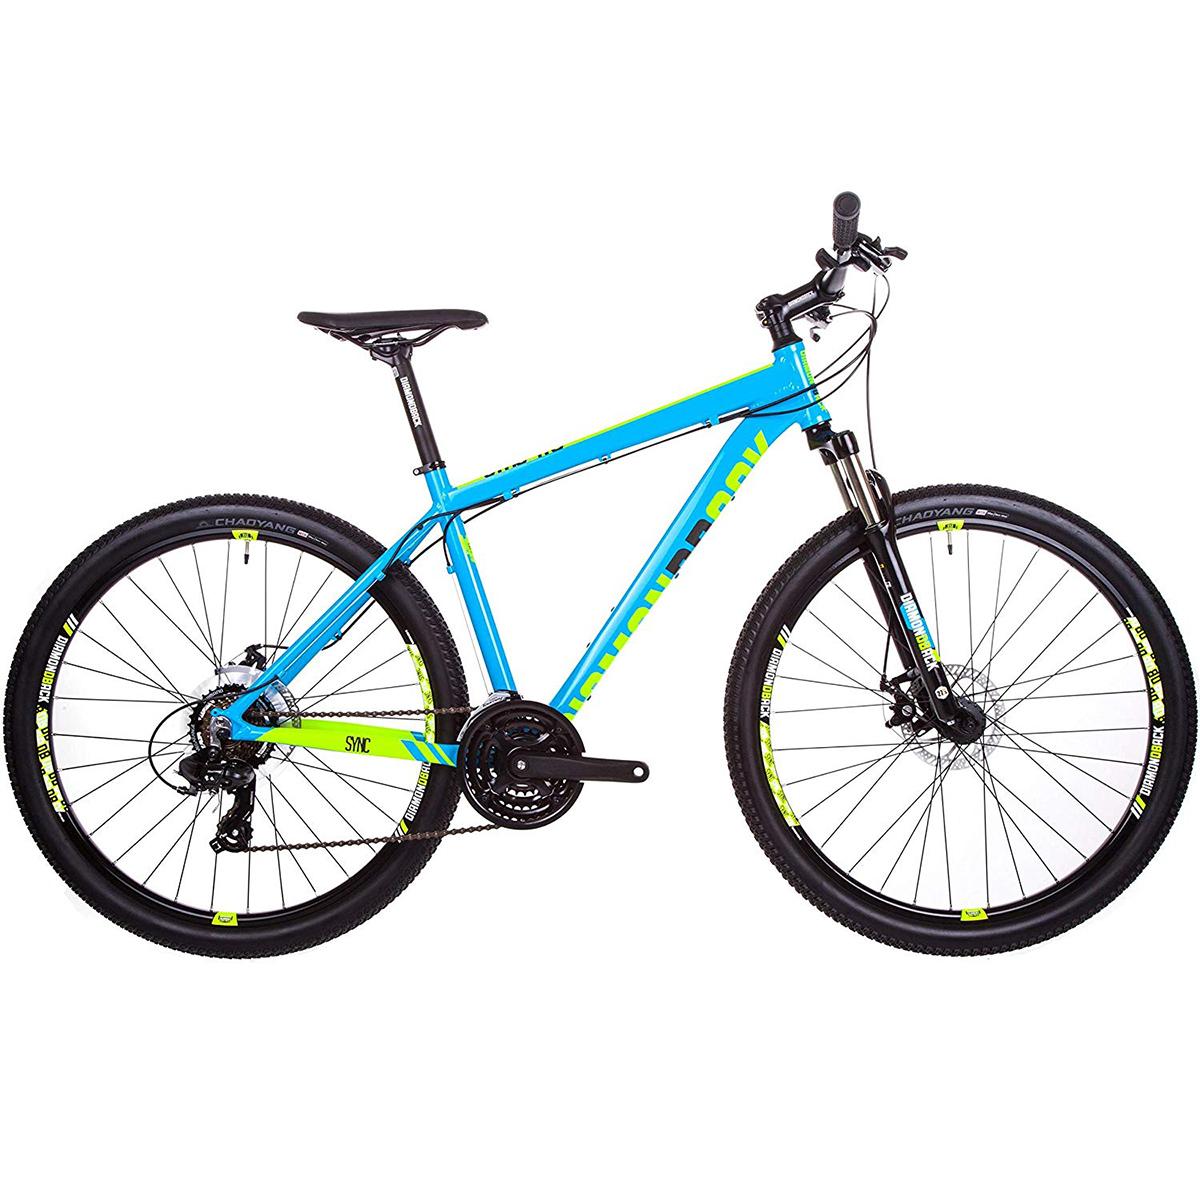 "Diamondback Sync 1.0 Mountain Bike 22"" £159 + £19.99 delivery Merlin Cycles"